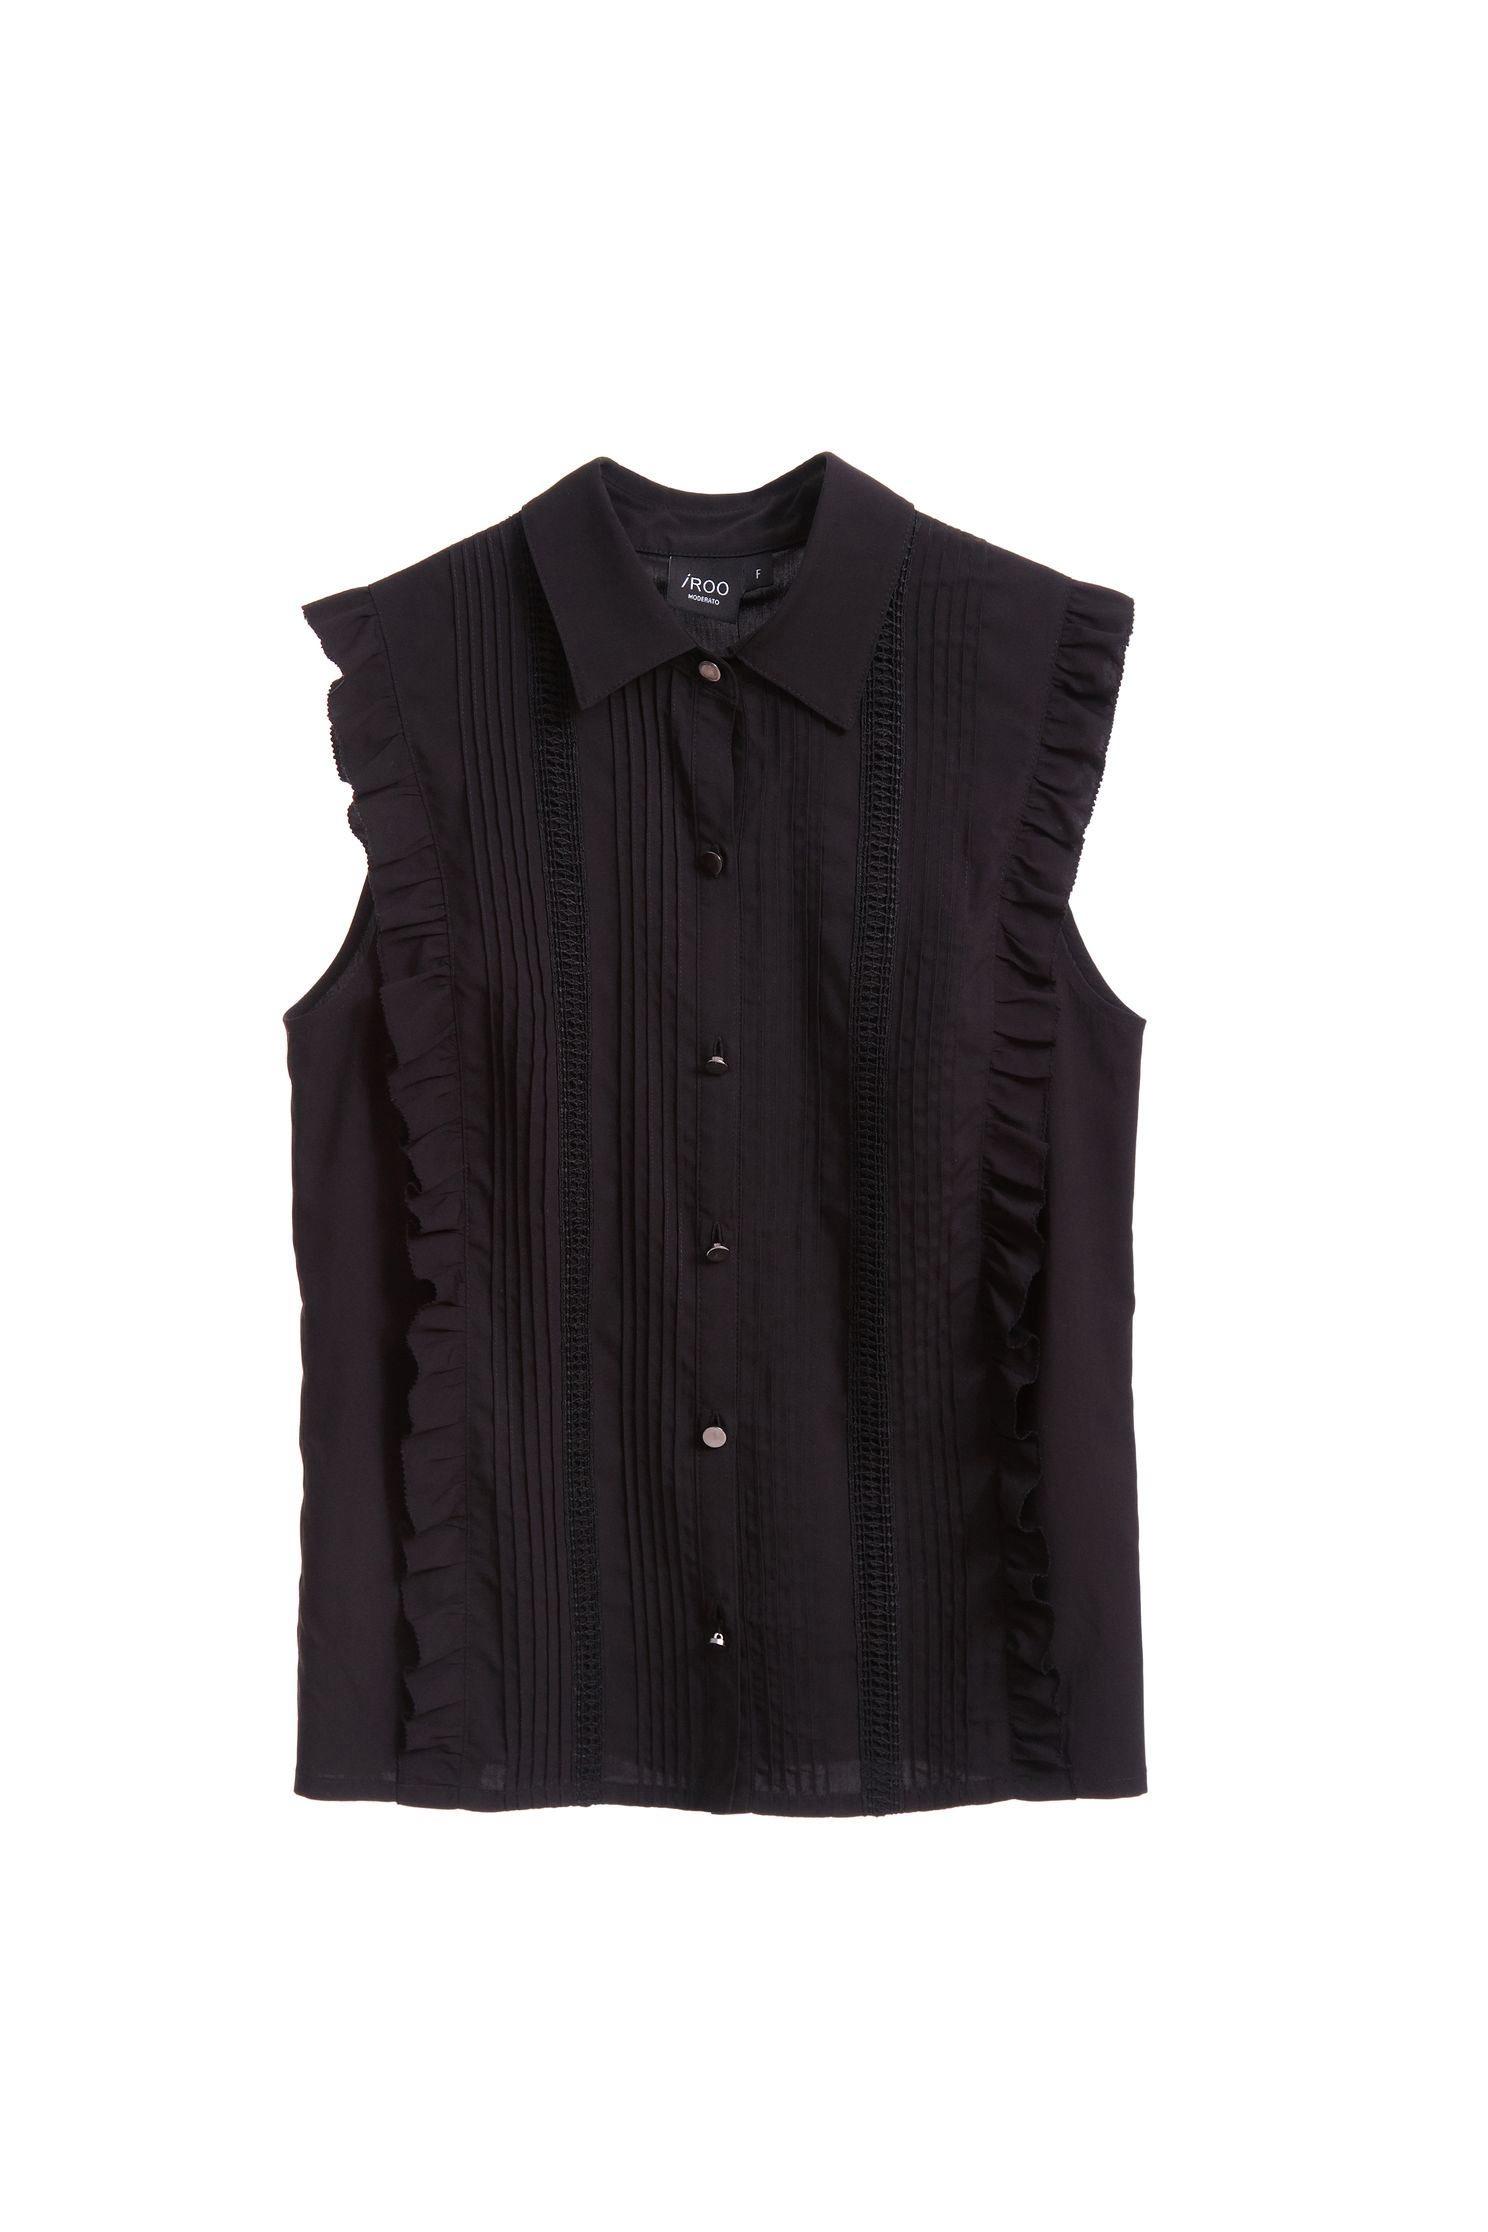 Ruffled classic shape sleeveless vest